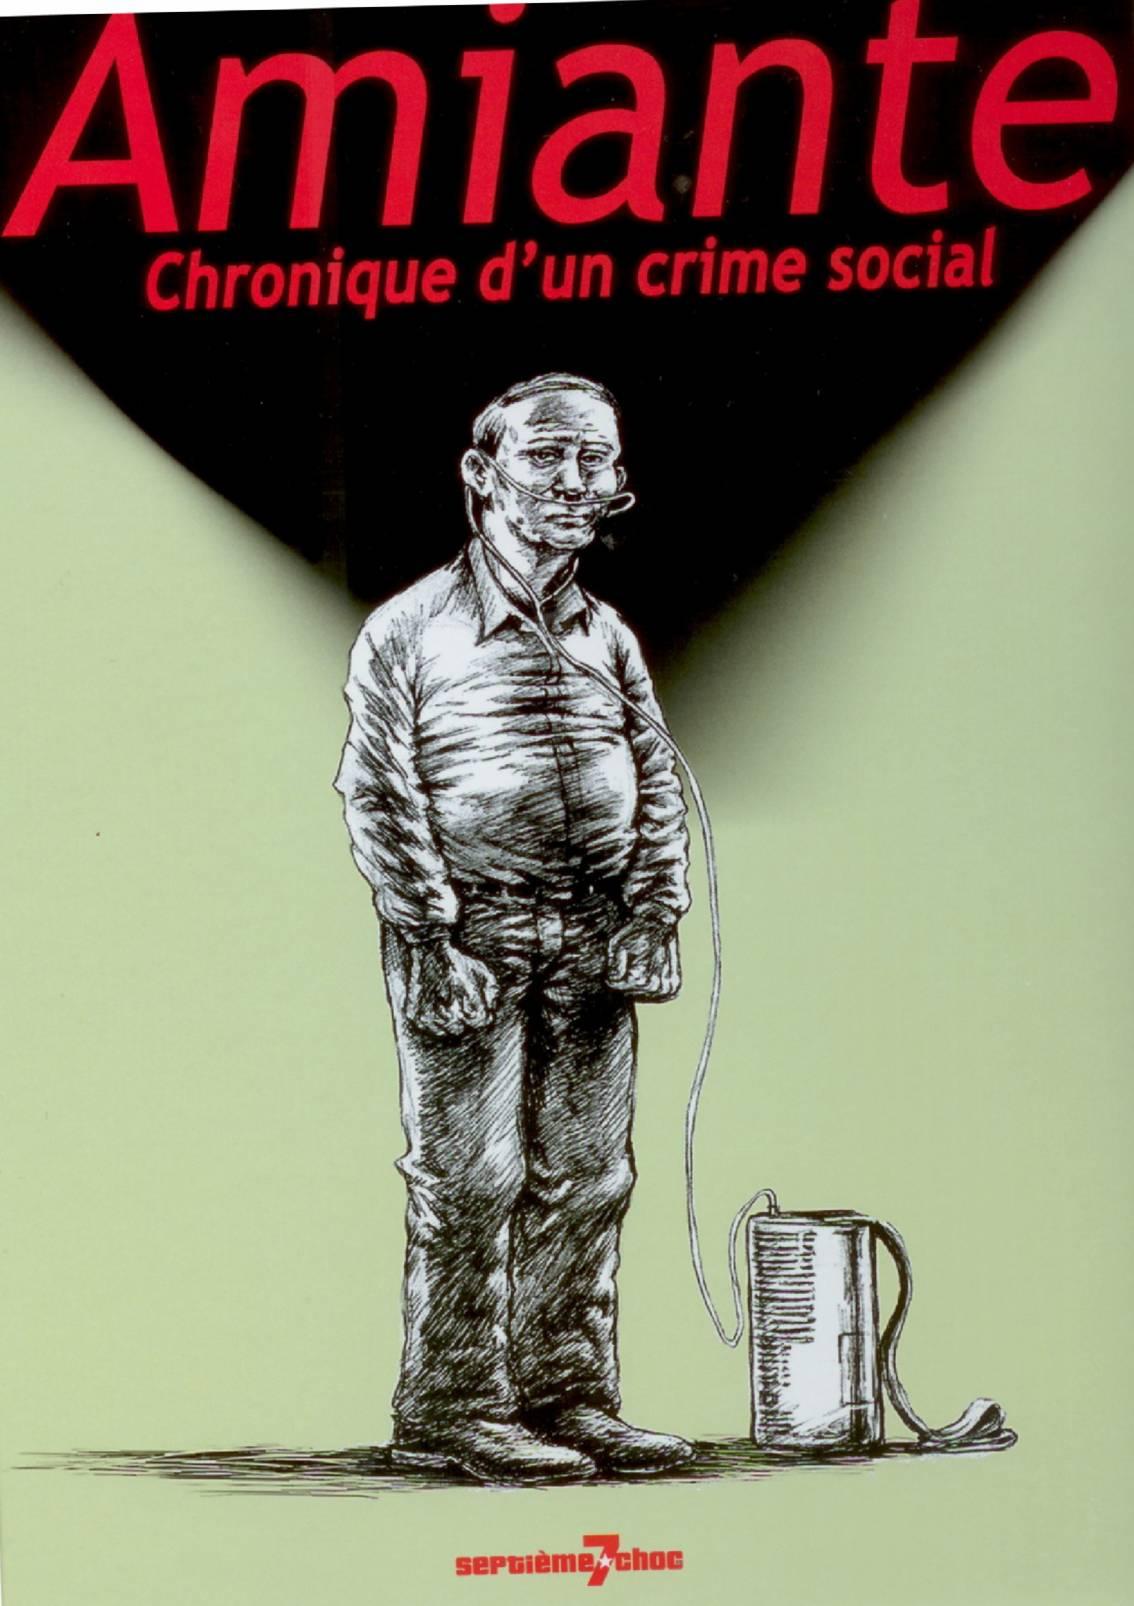 http://andeva.free.fr/publications/2005_0924%20BD%20Amiante.jpg